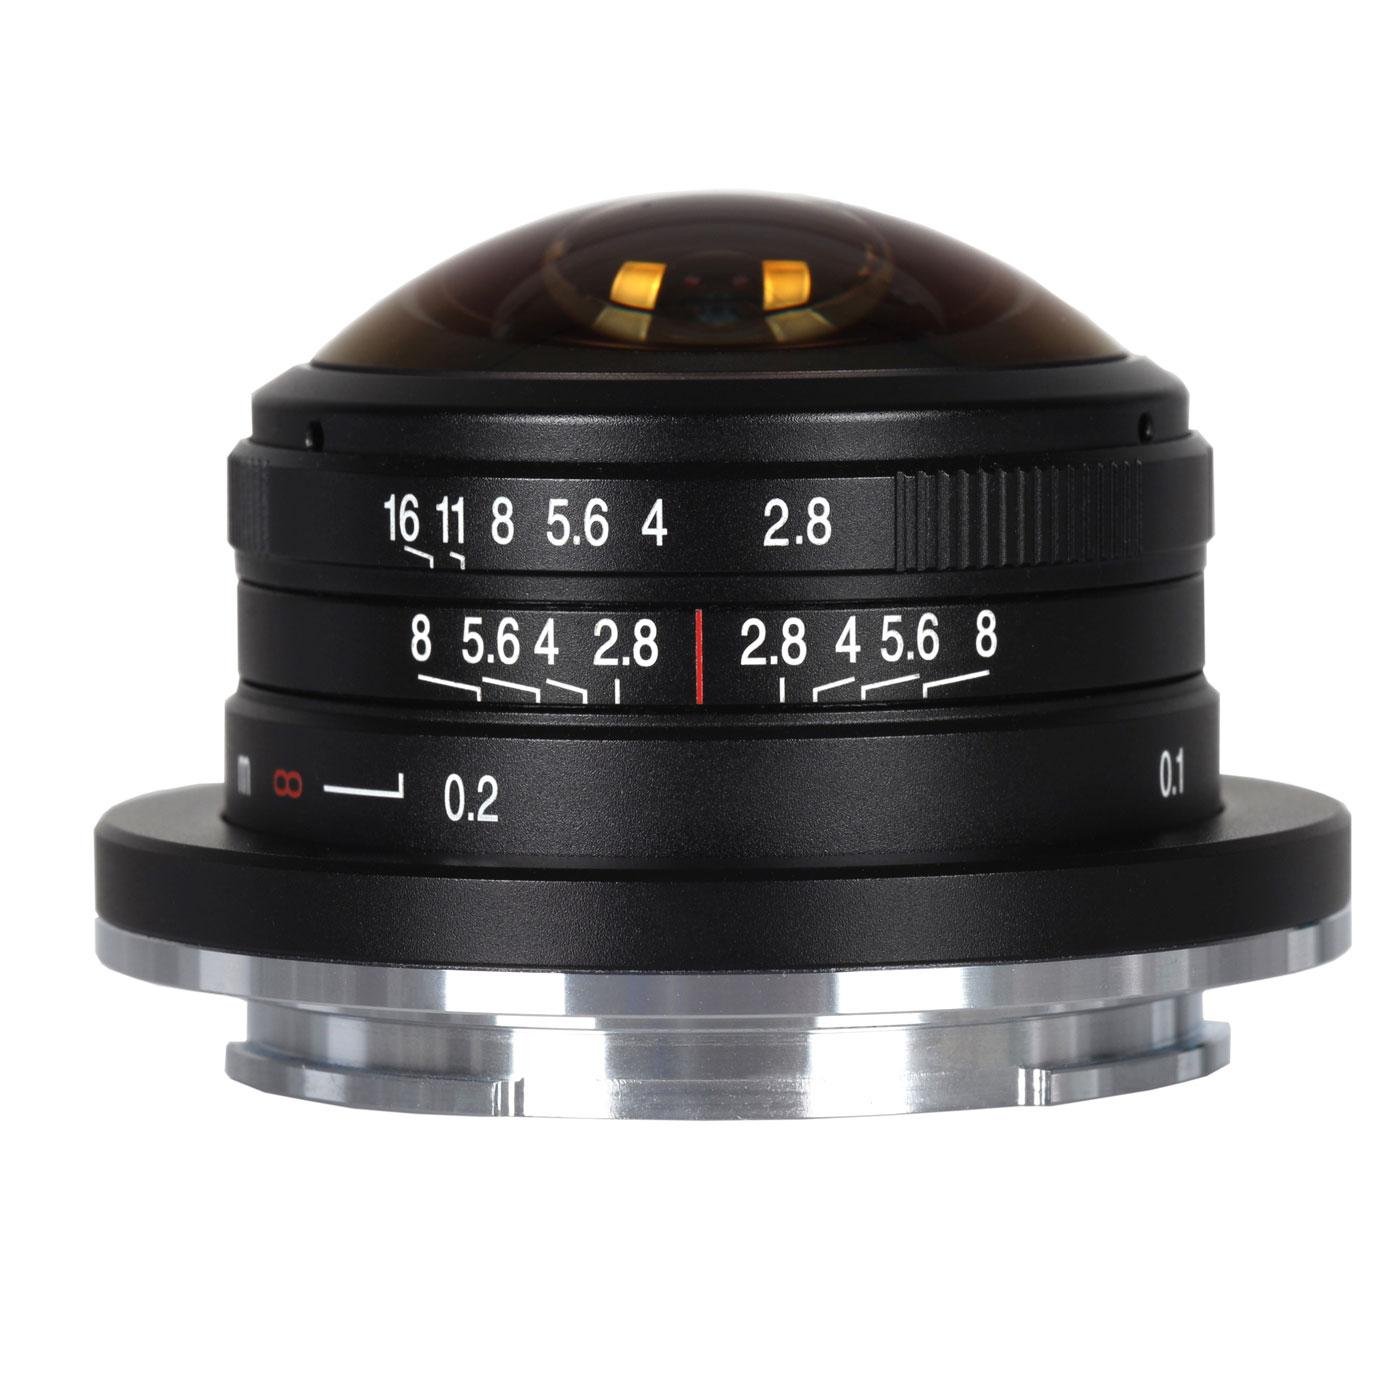 Laowa 4 mm 1:2,8 Fisheye für Canon EOS-M